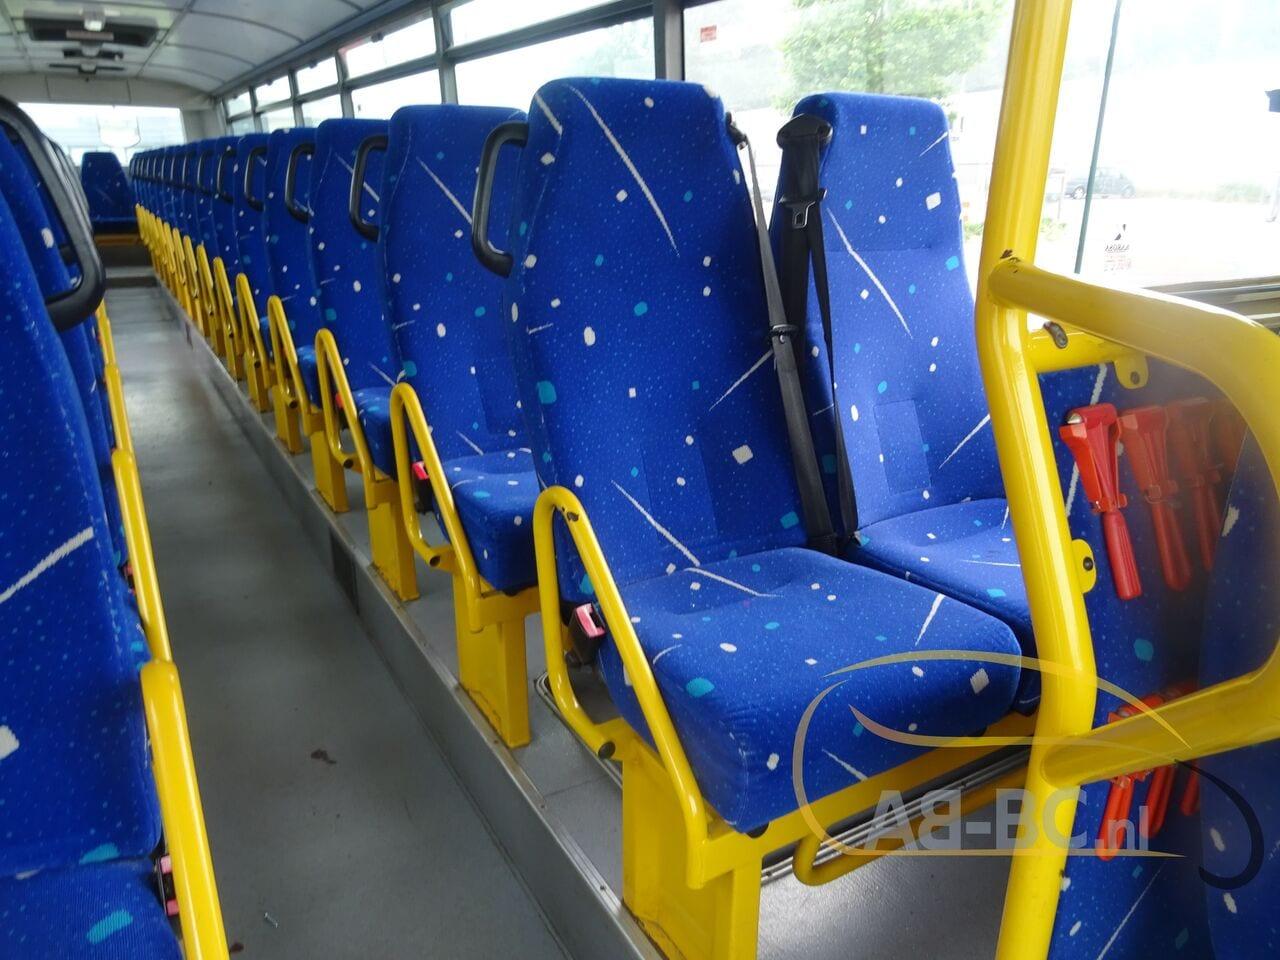 interurban-busIVECO-Irisbus-Recreo-64-Seats---1626160087889026084_big_2544d620967d63547b78658acd2bf84f--21071309575983154500